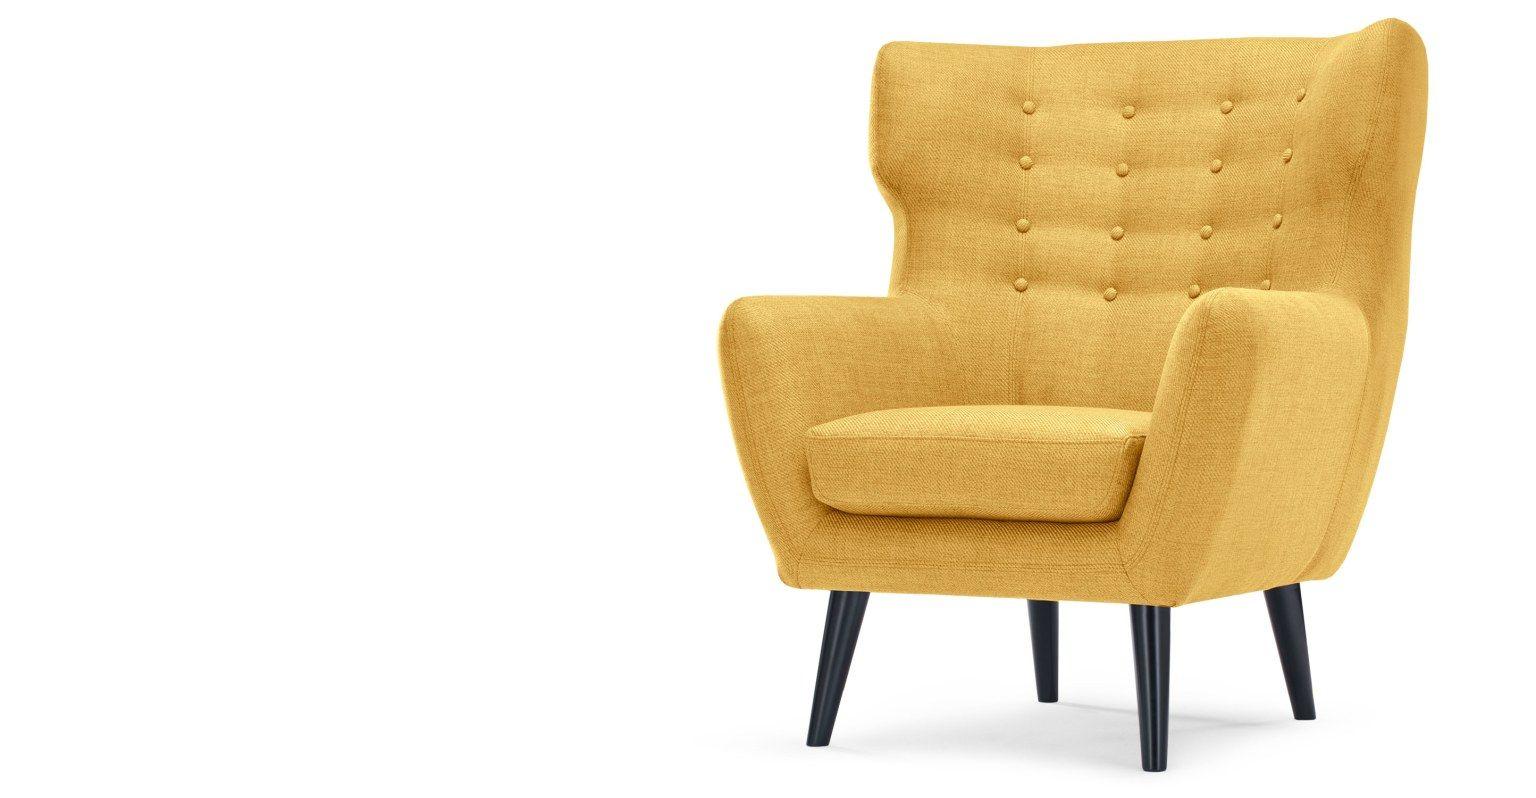 Made Ochre Yellow Armchair In 2020 Armchair Chair Furniture